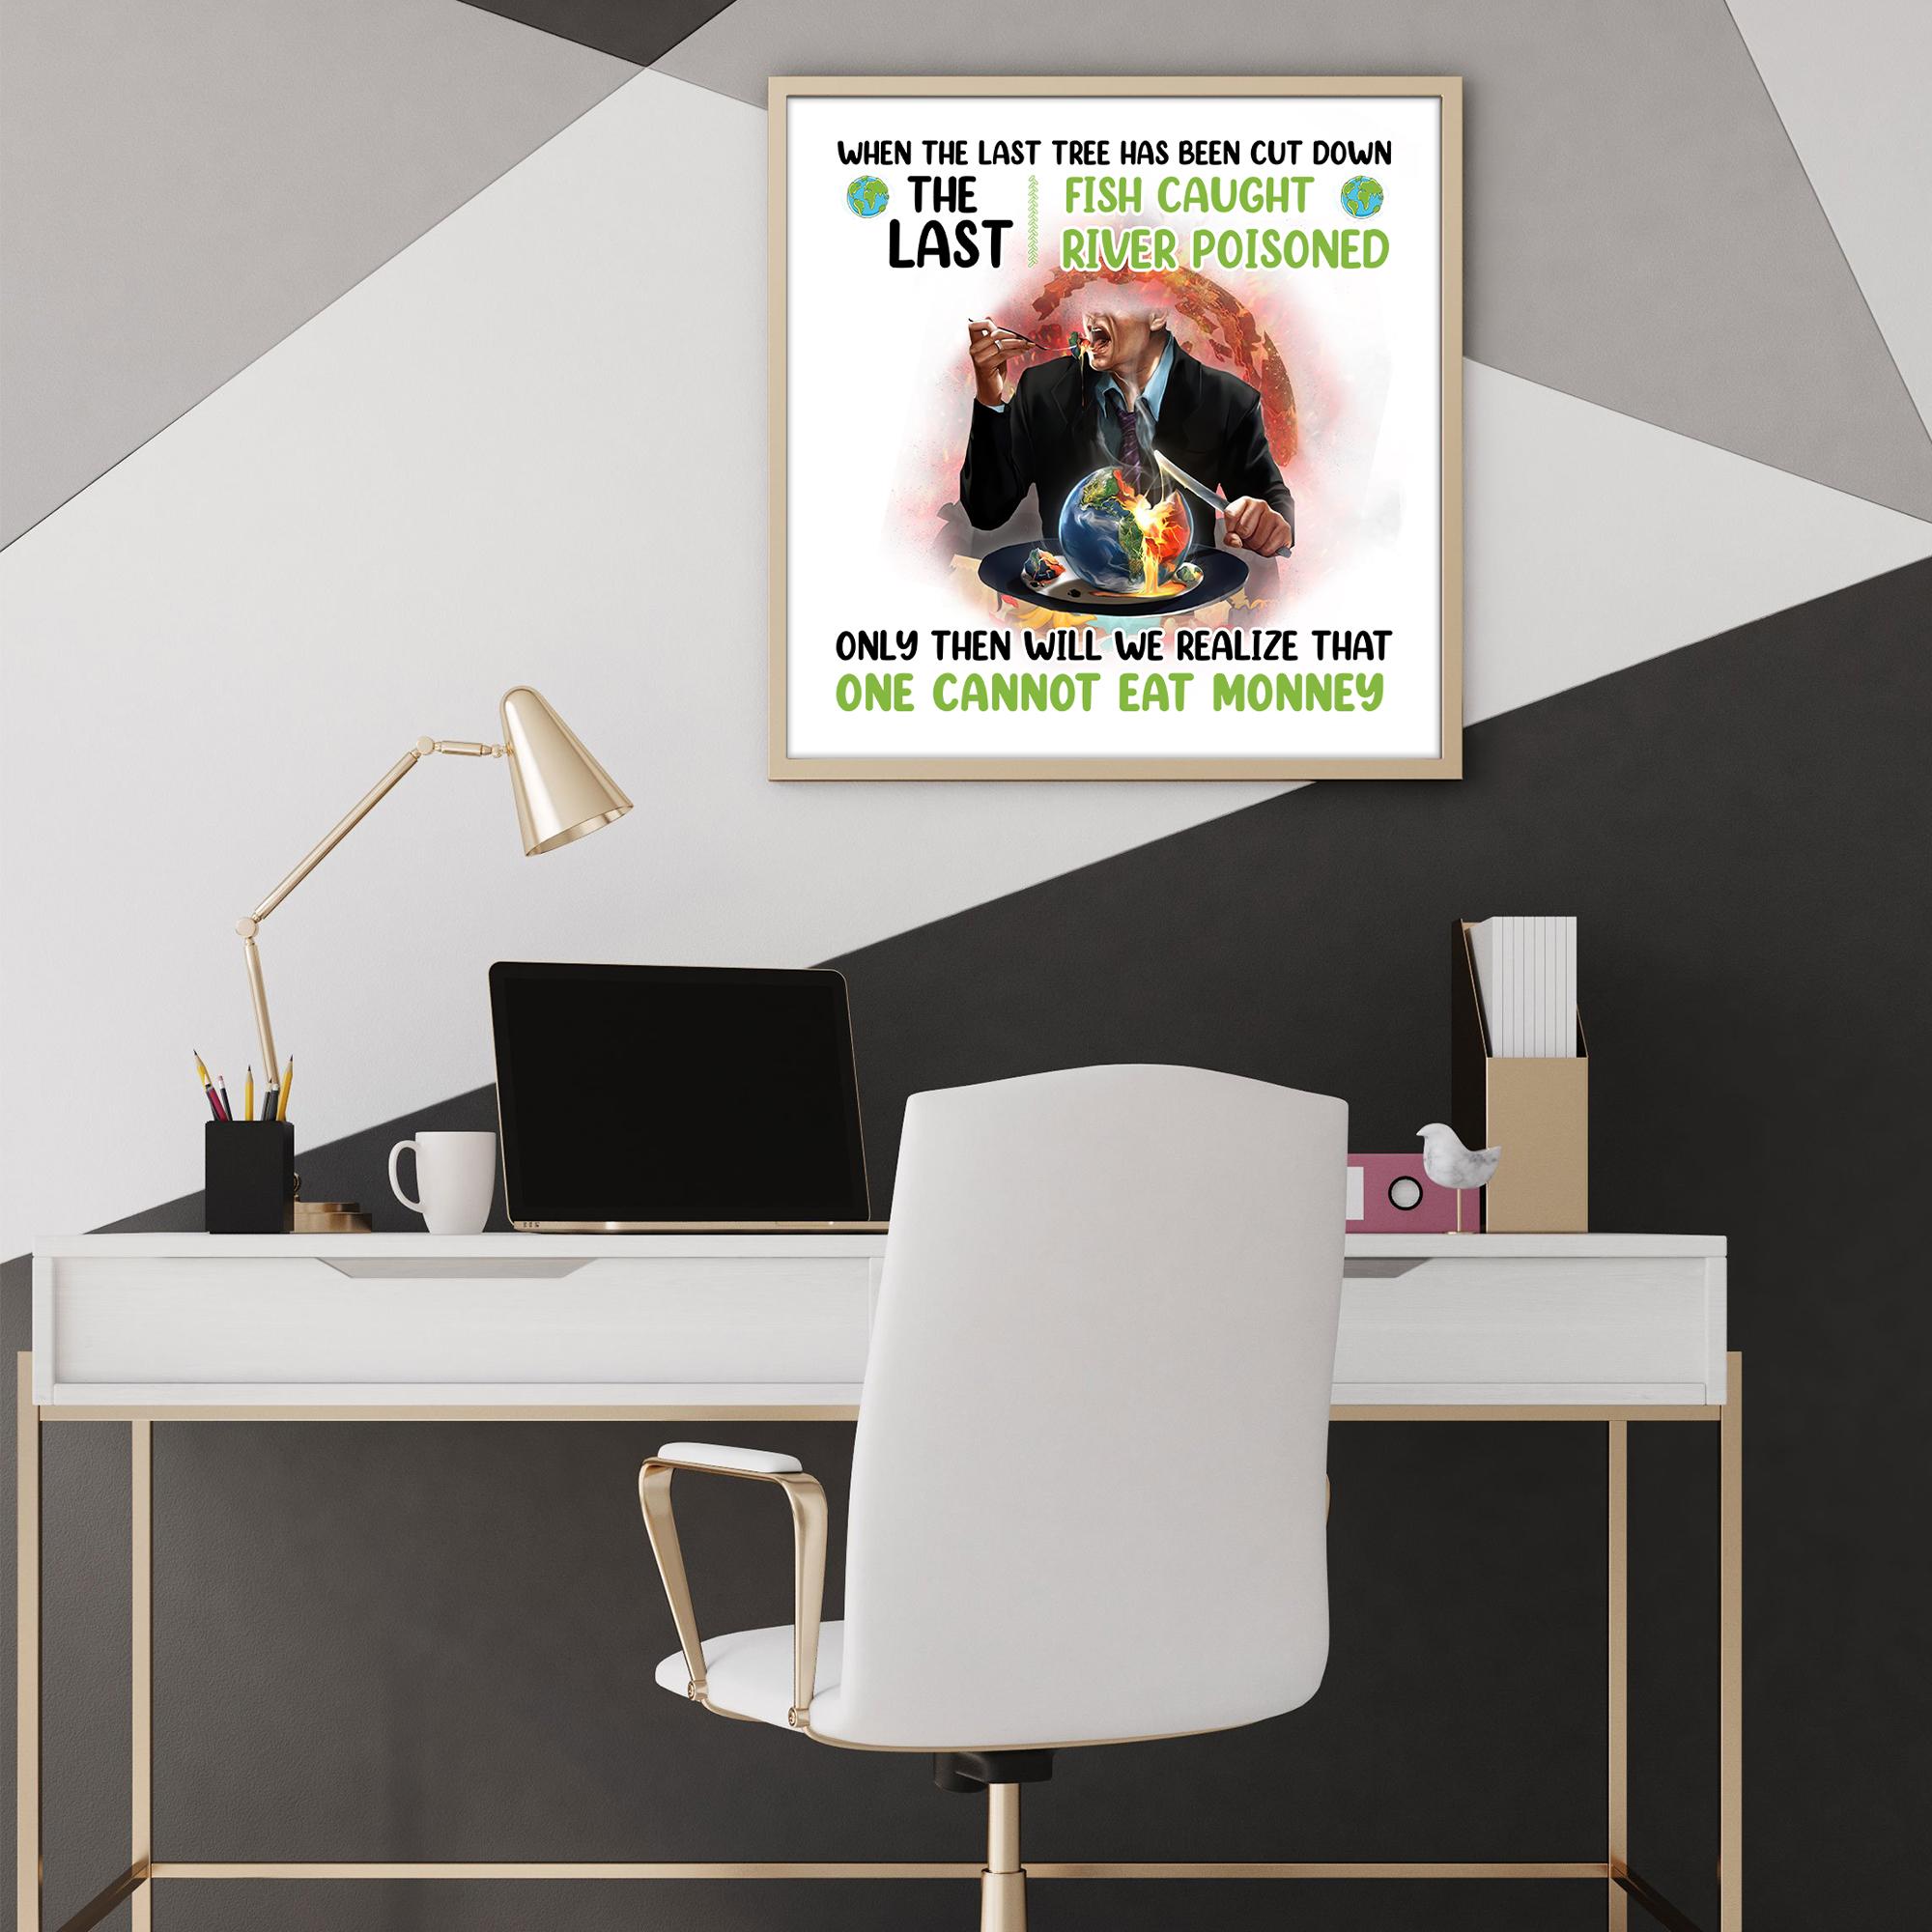 Awareness Proverb Poster - Zero Waste Initiative 28